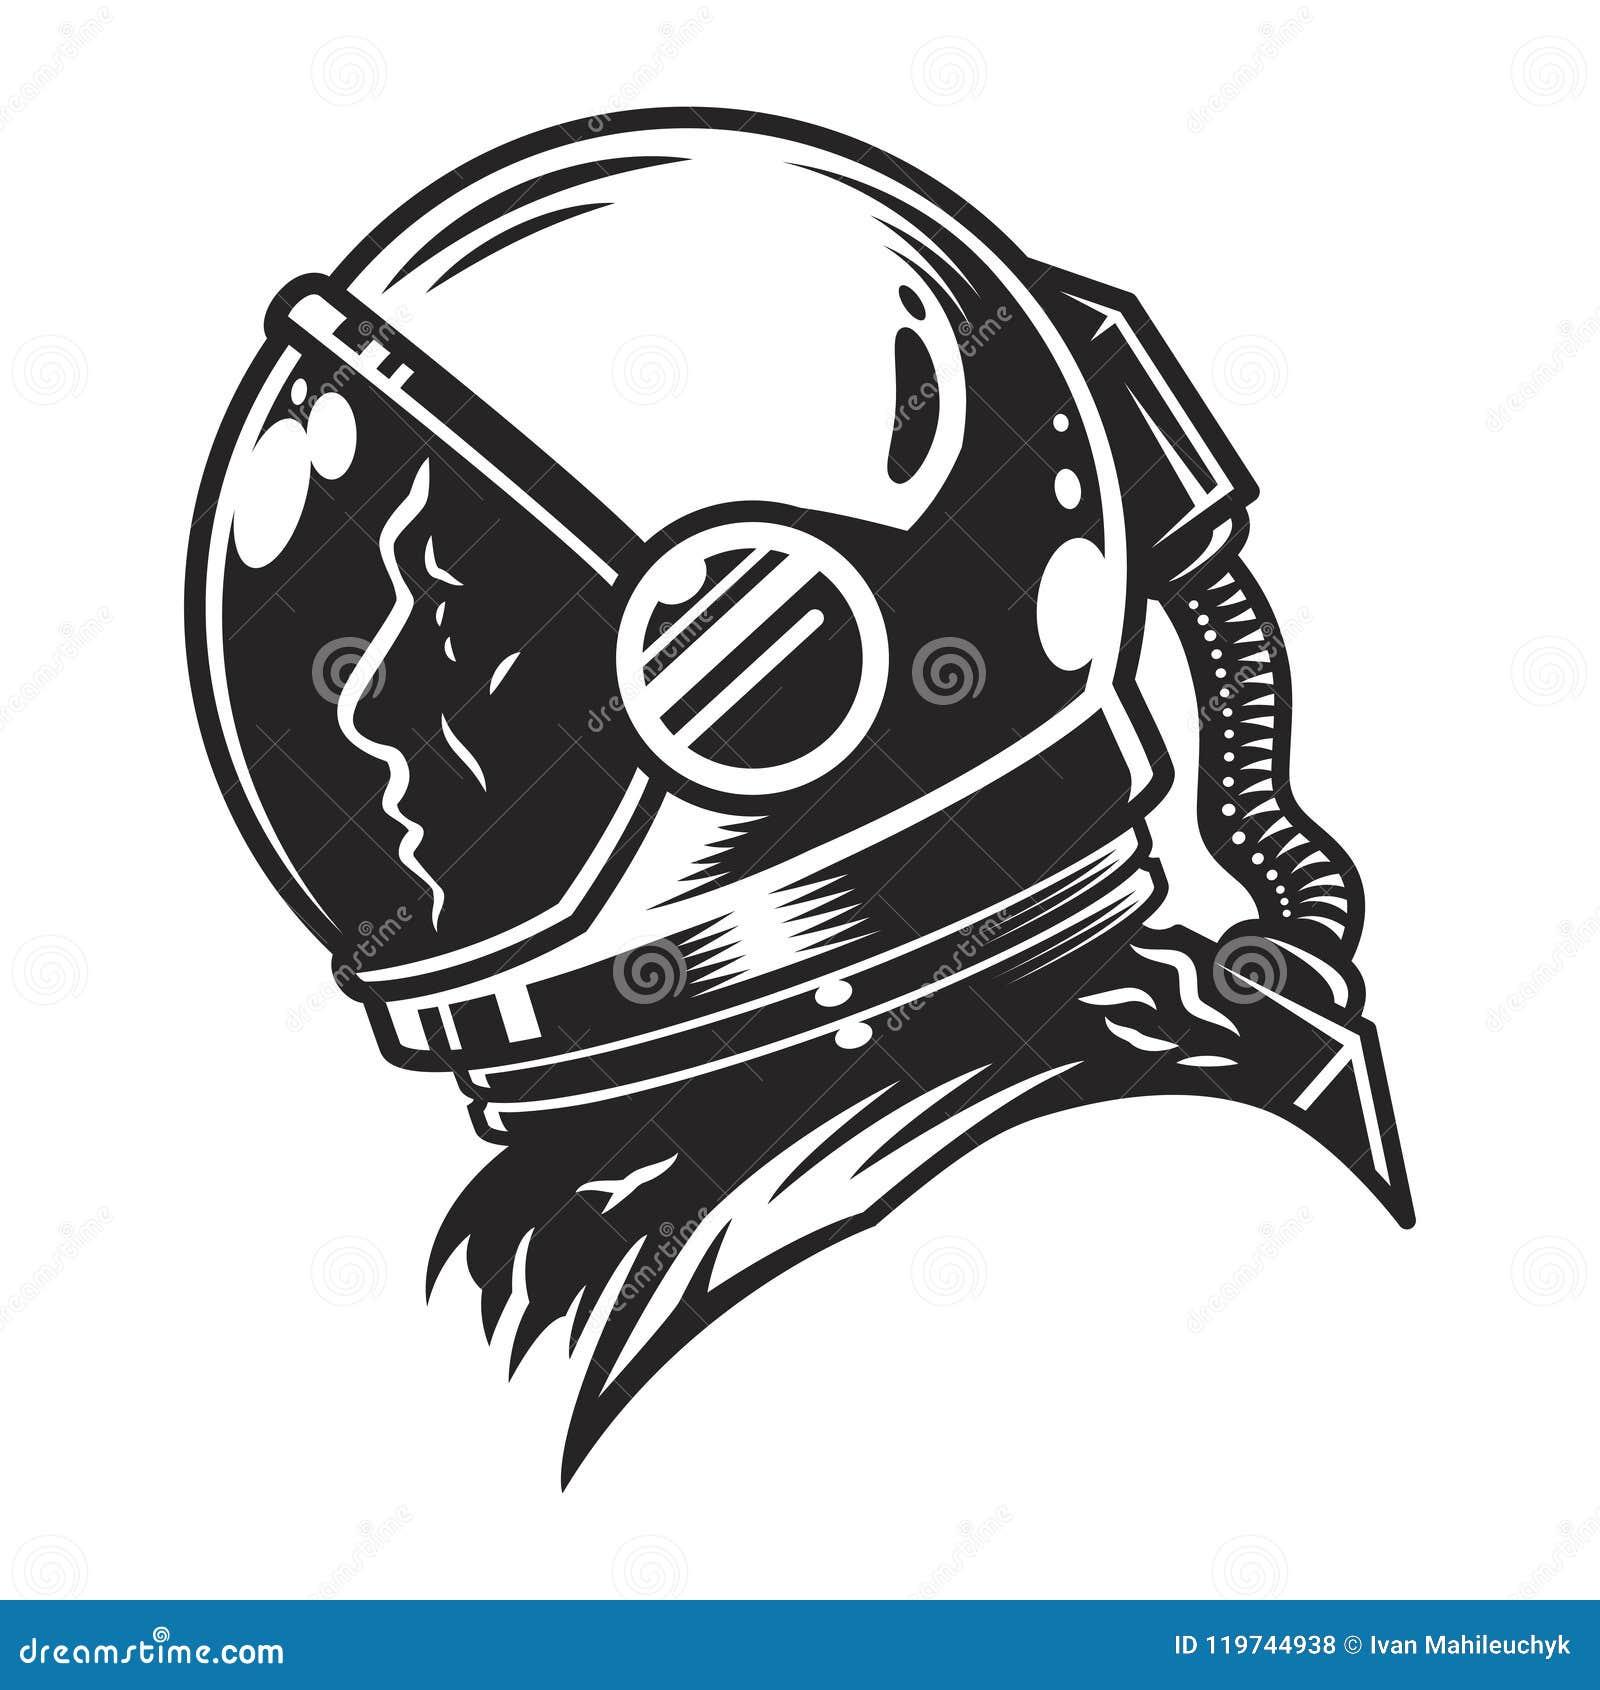 Football helmet drawing template bcca football helmet drawing template maxwellsz